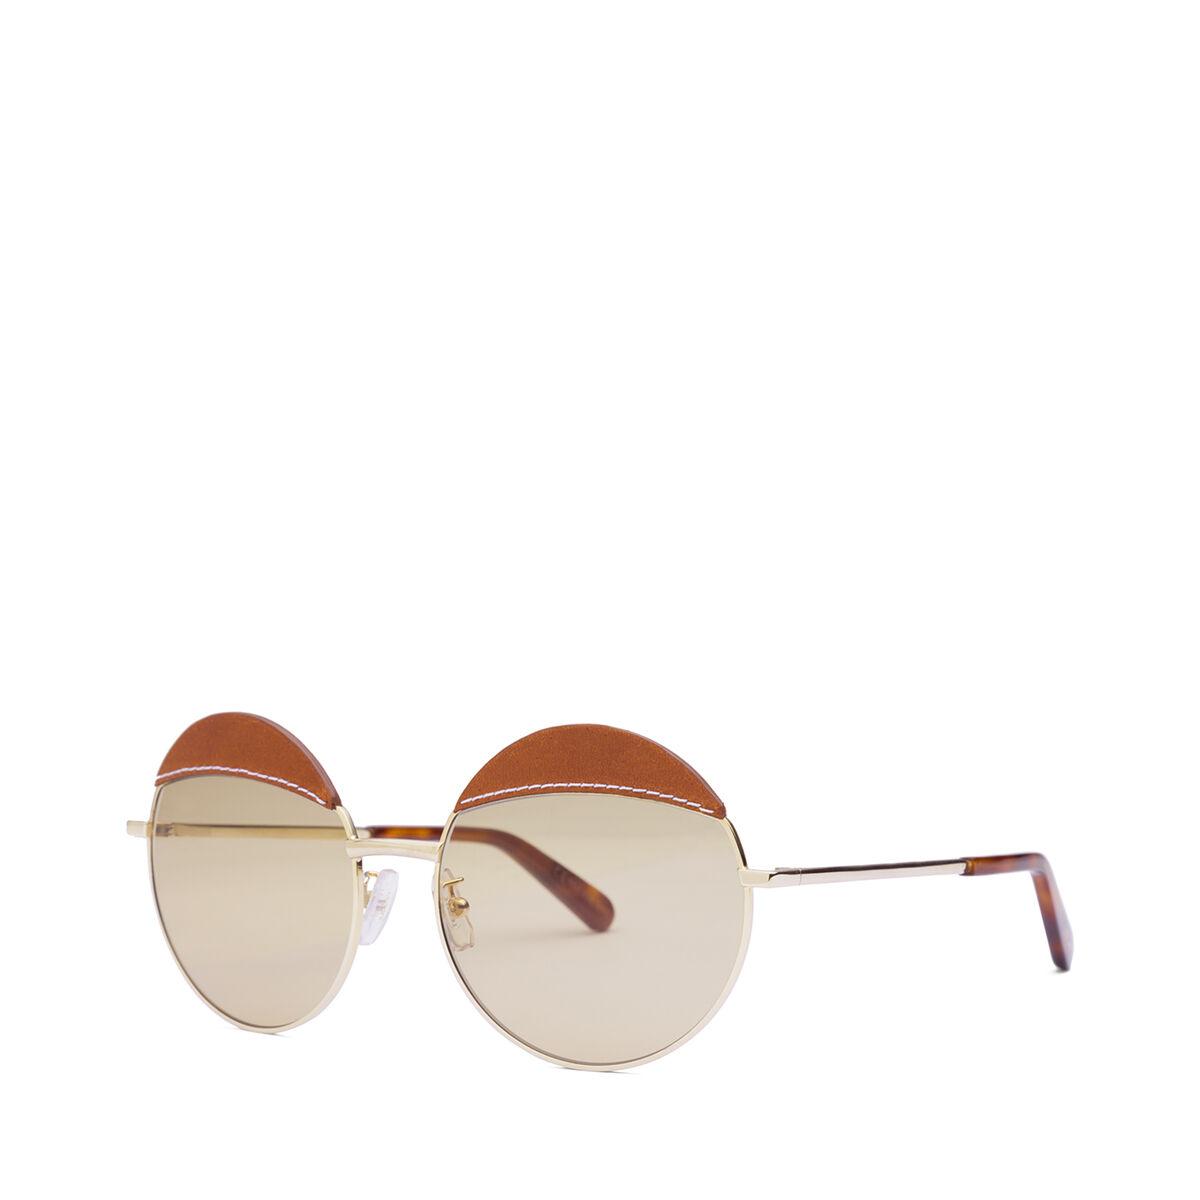 LOEWE Round Sticth Sunglasses Brown/Light Brown front